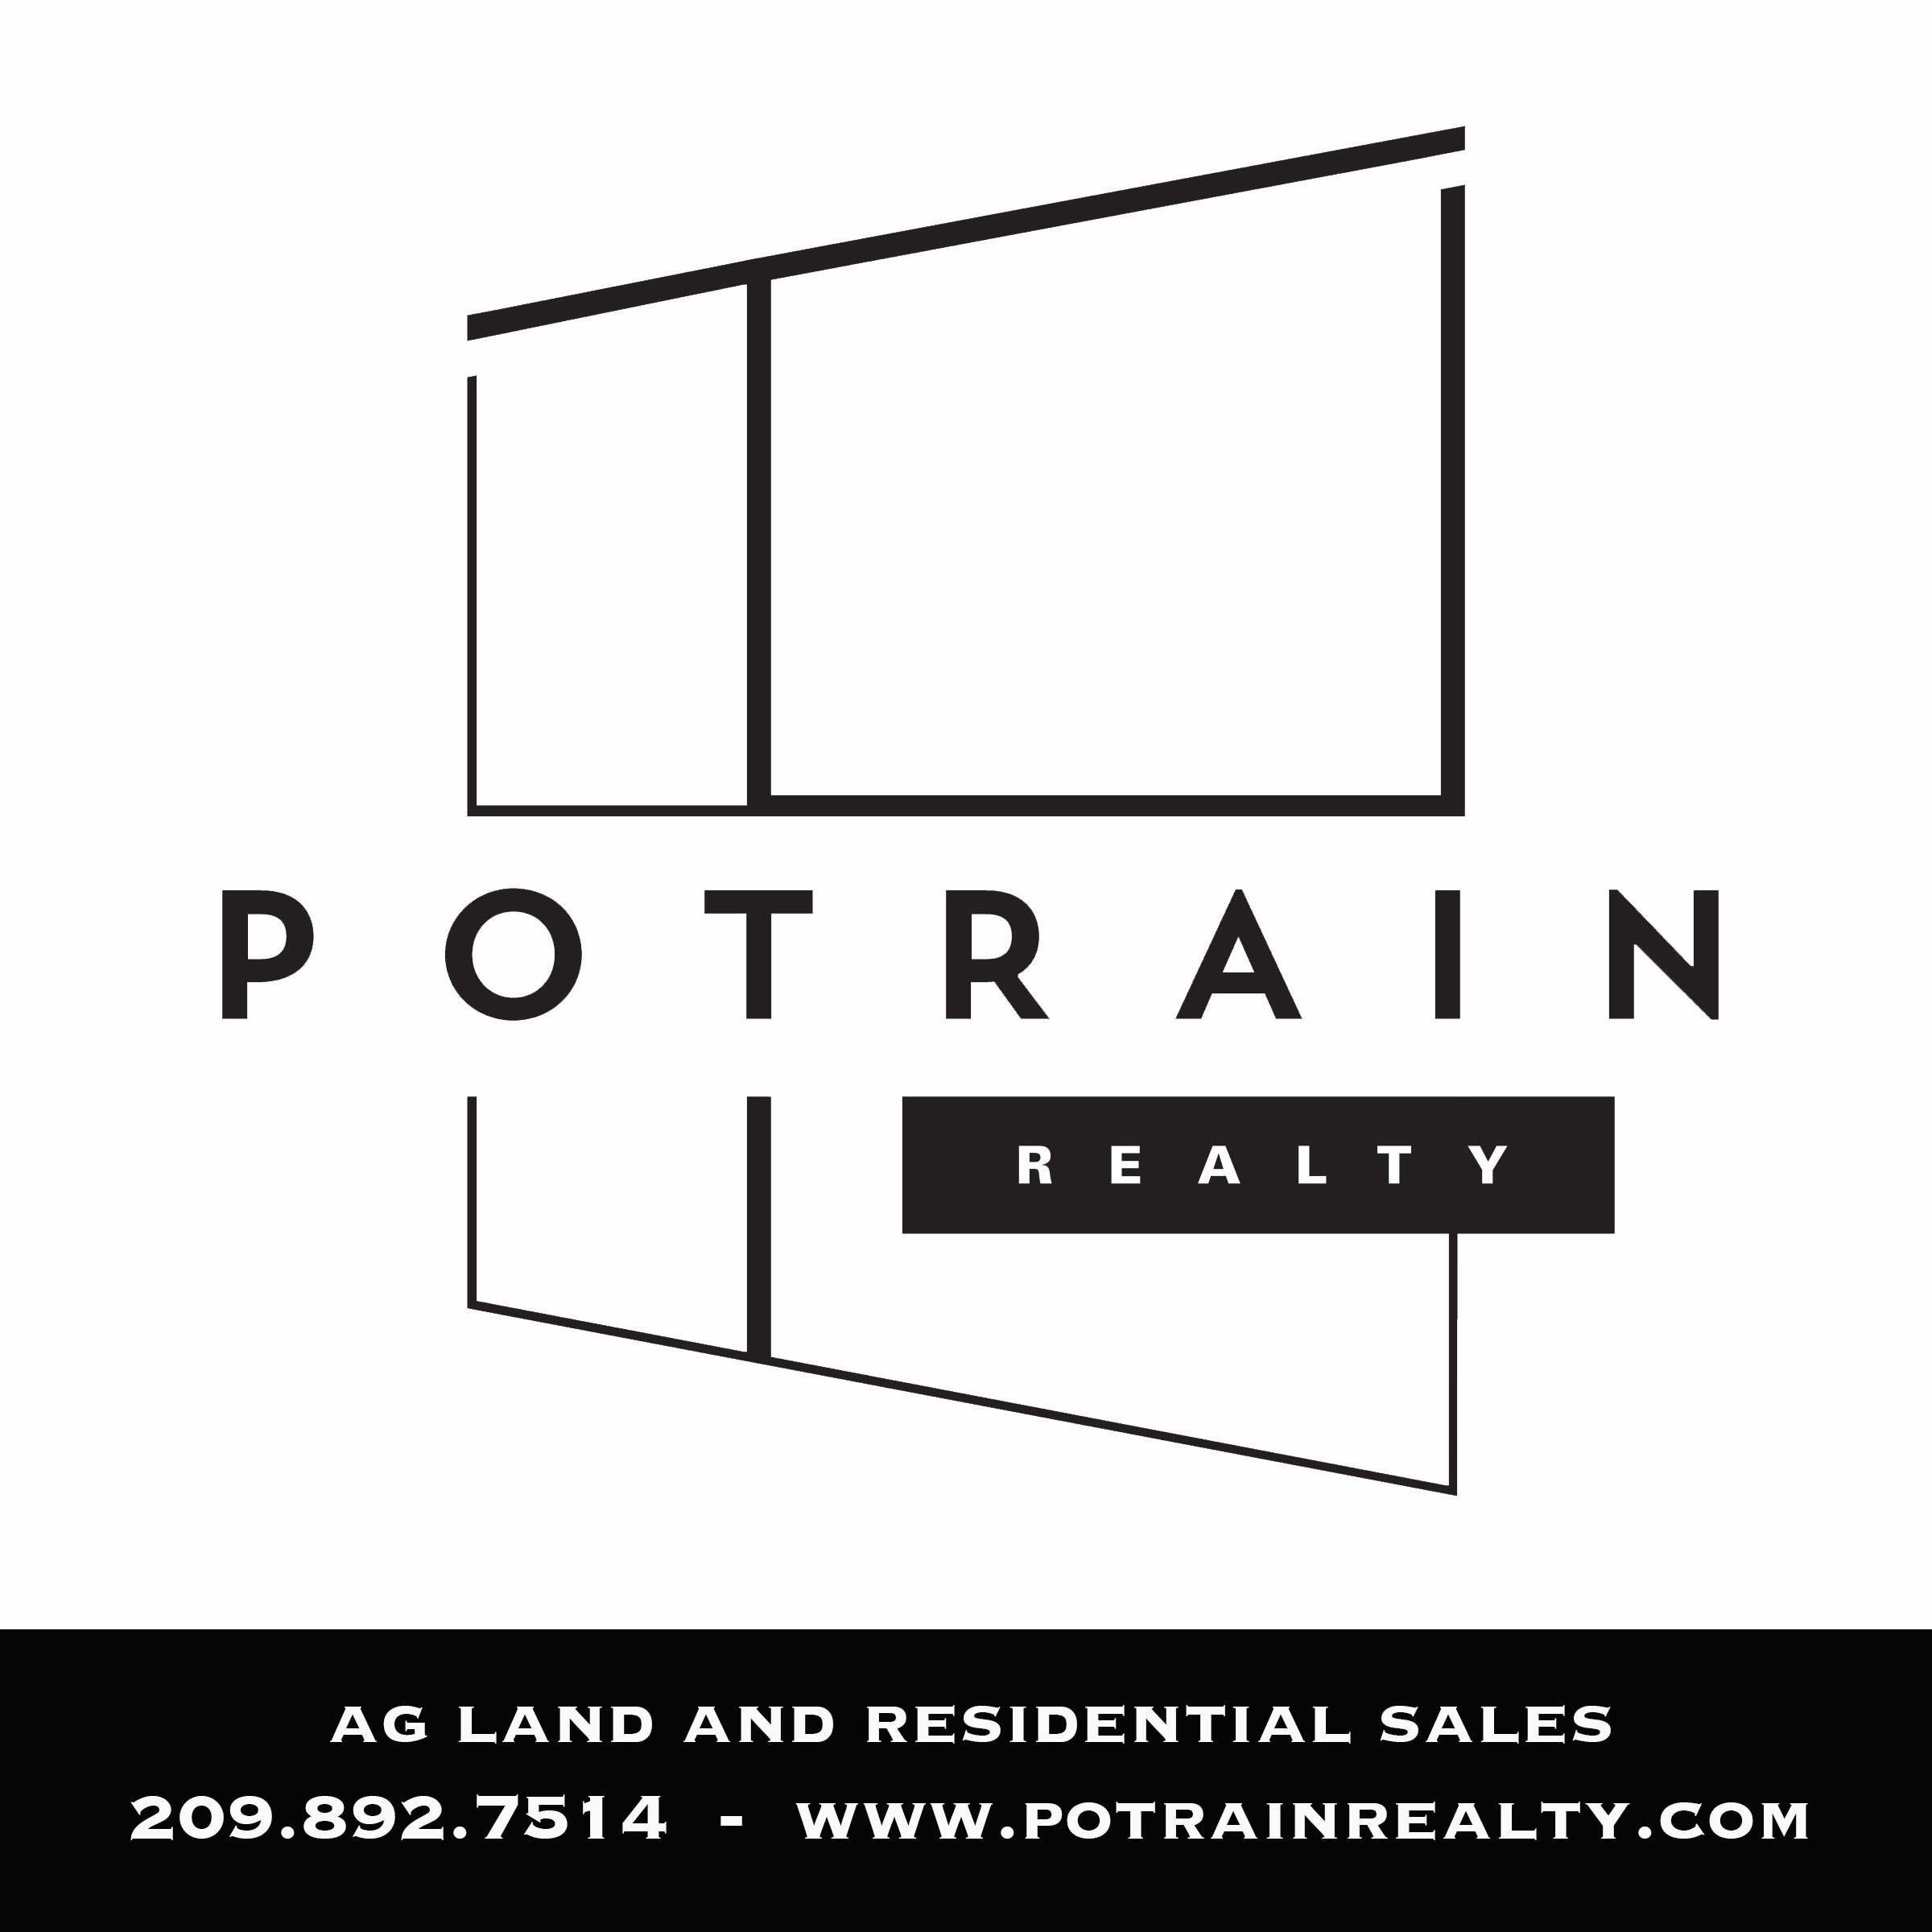 Potrain Realty - sidebar